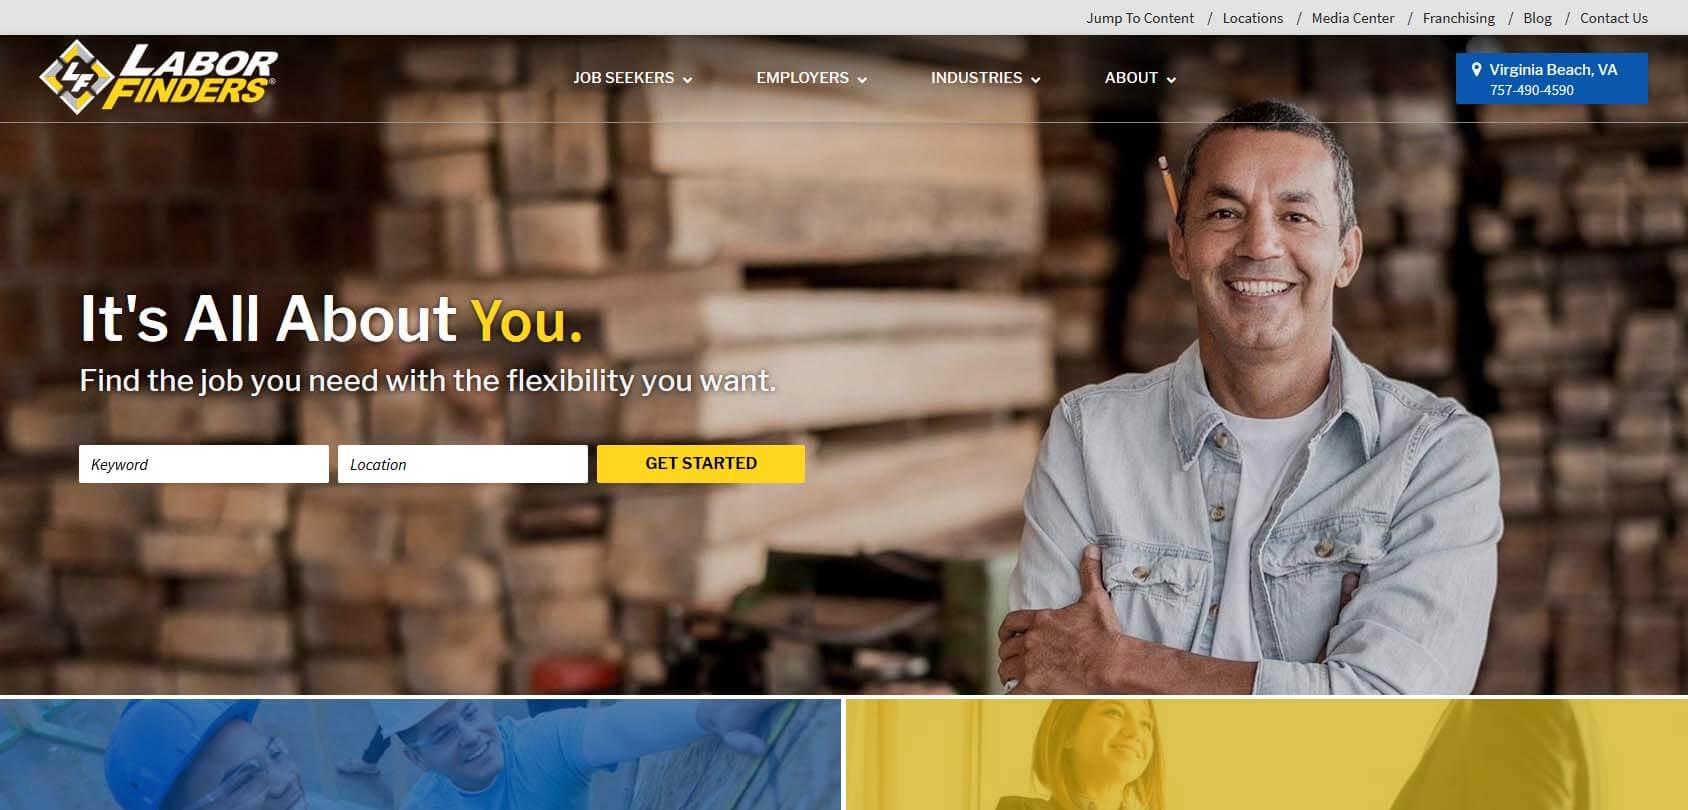 Labor Finders Homepage